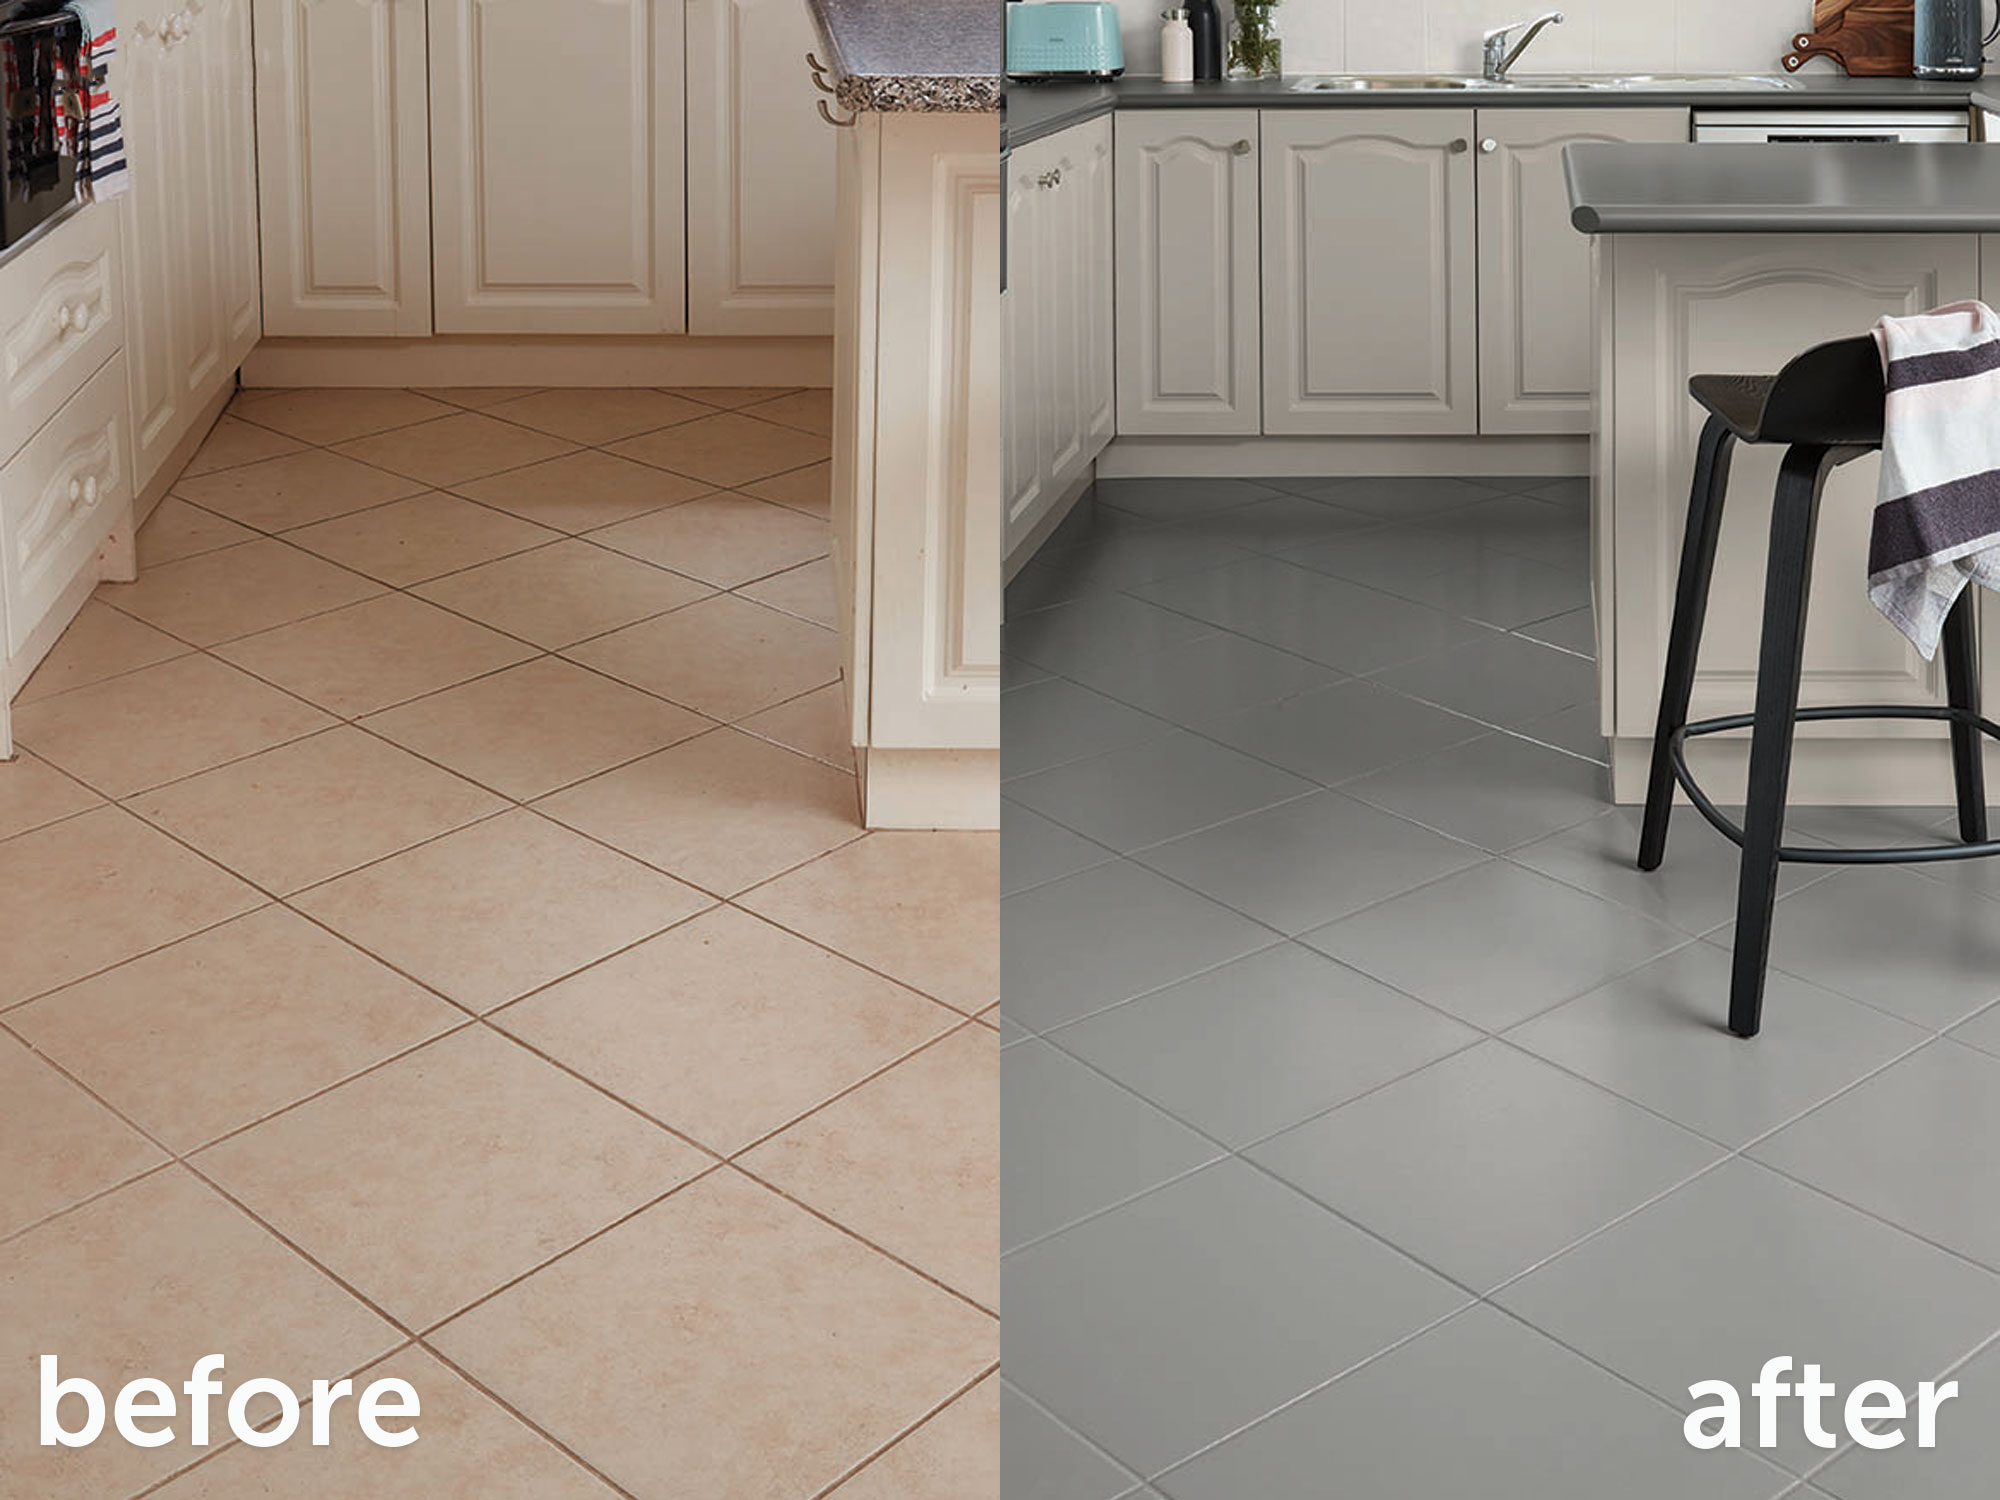 how to paint floor tiles in 6 steps